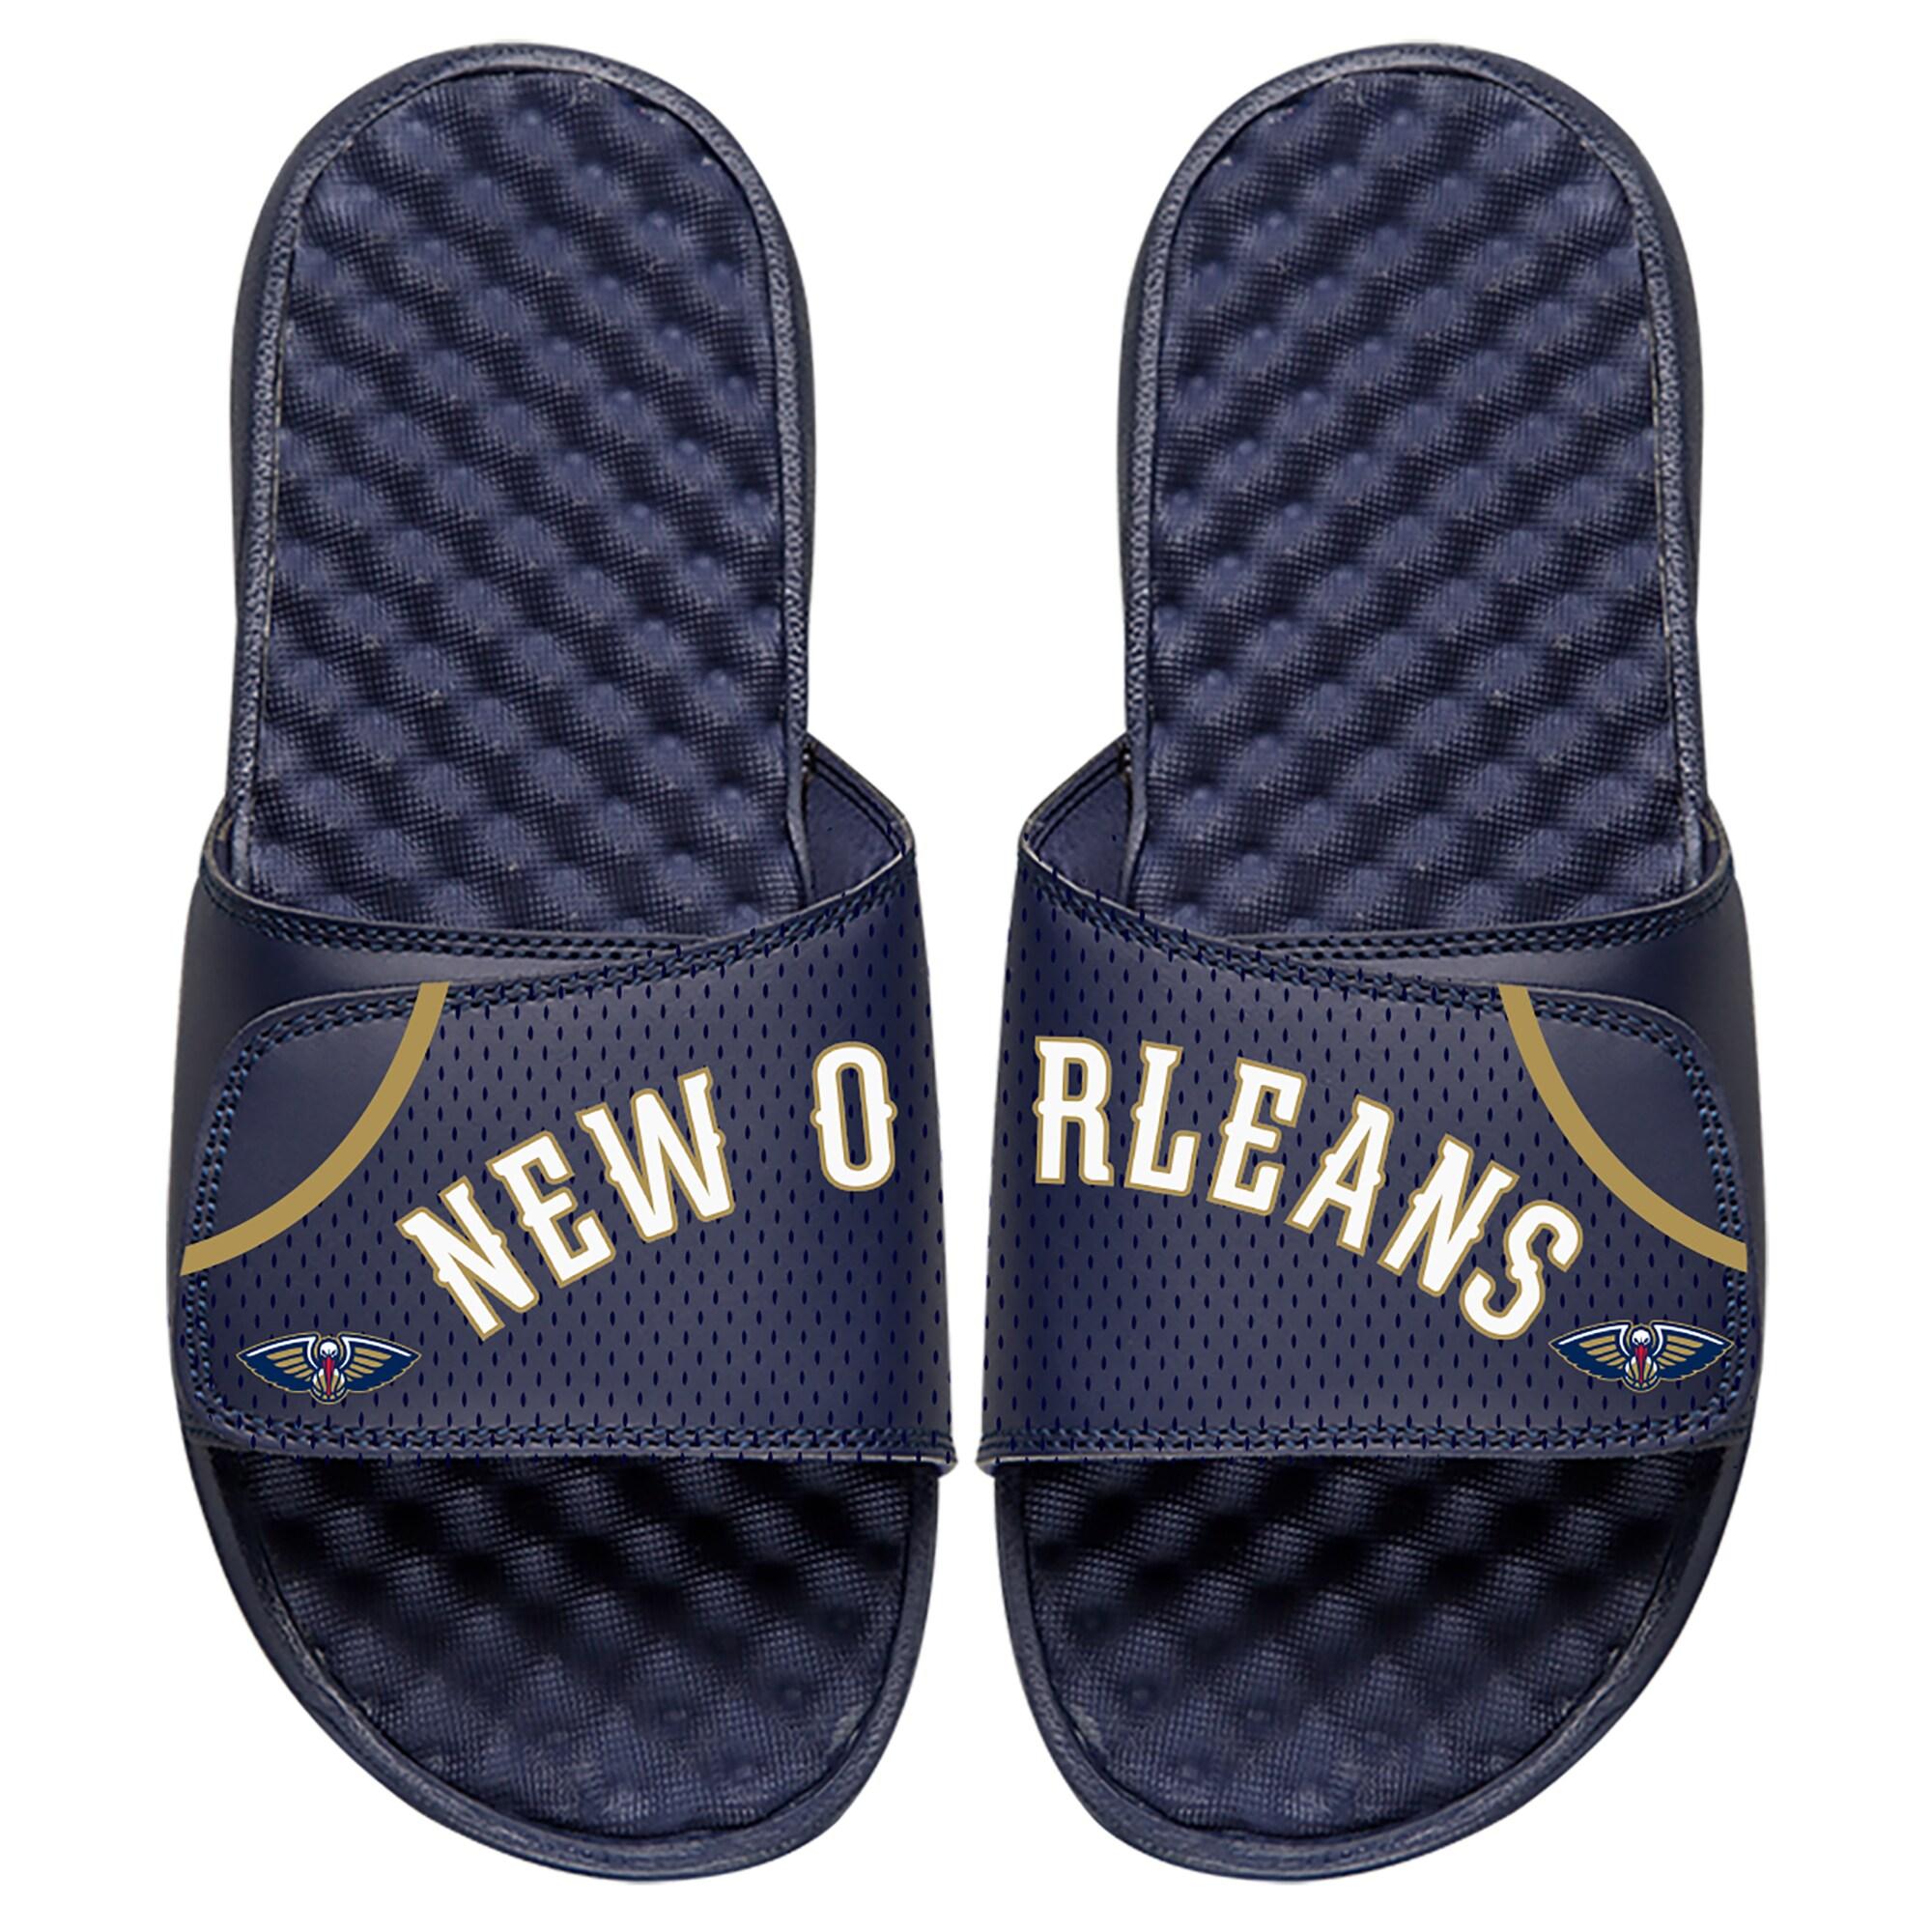 New Orleans Pelicans ISlide Home Jersey Split Slide Sandals - Navy